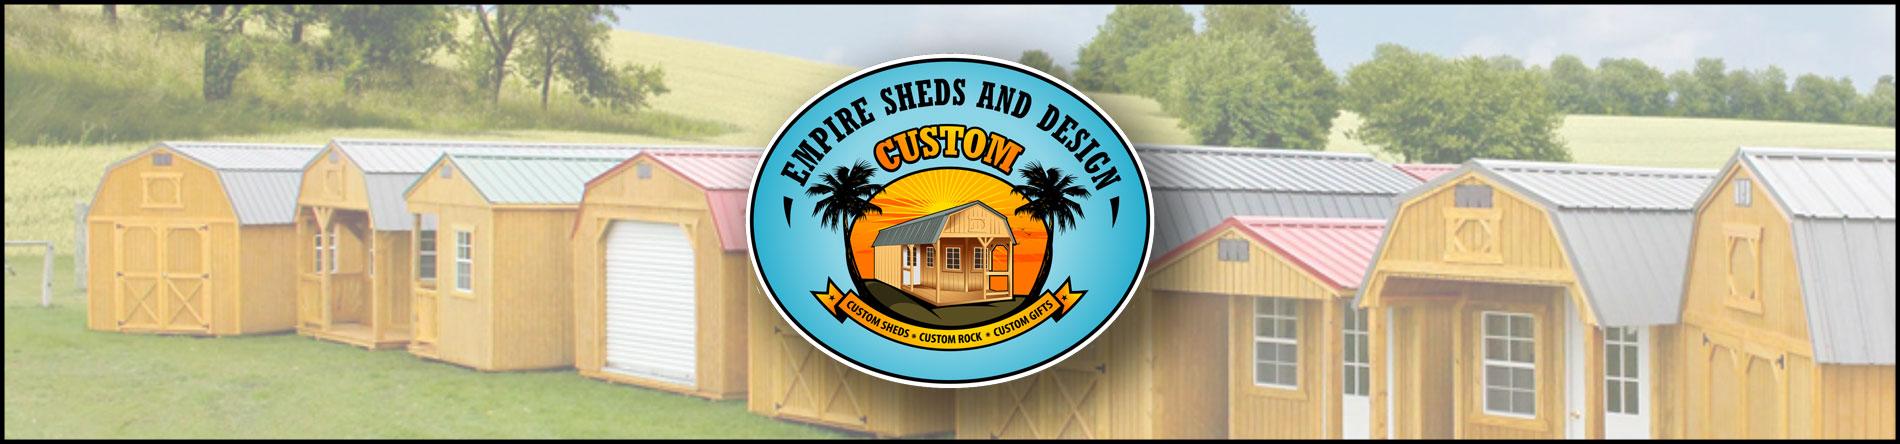 Empire Sheds and Design Designs Sheds in Modesto, CA